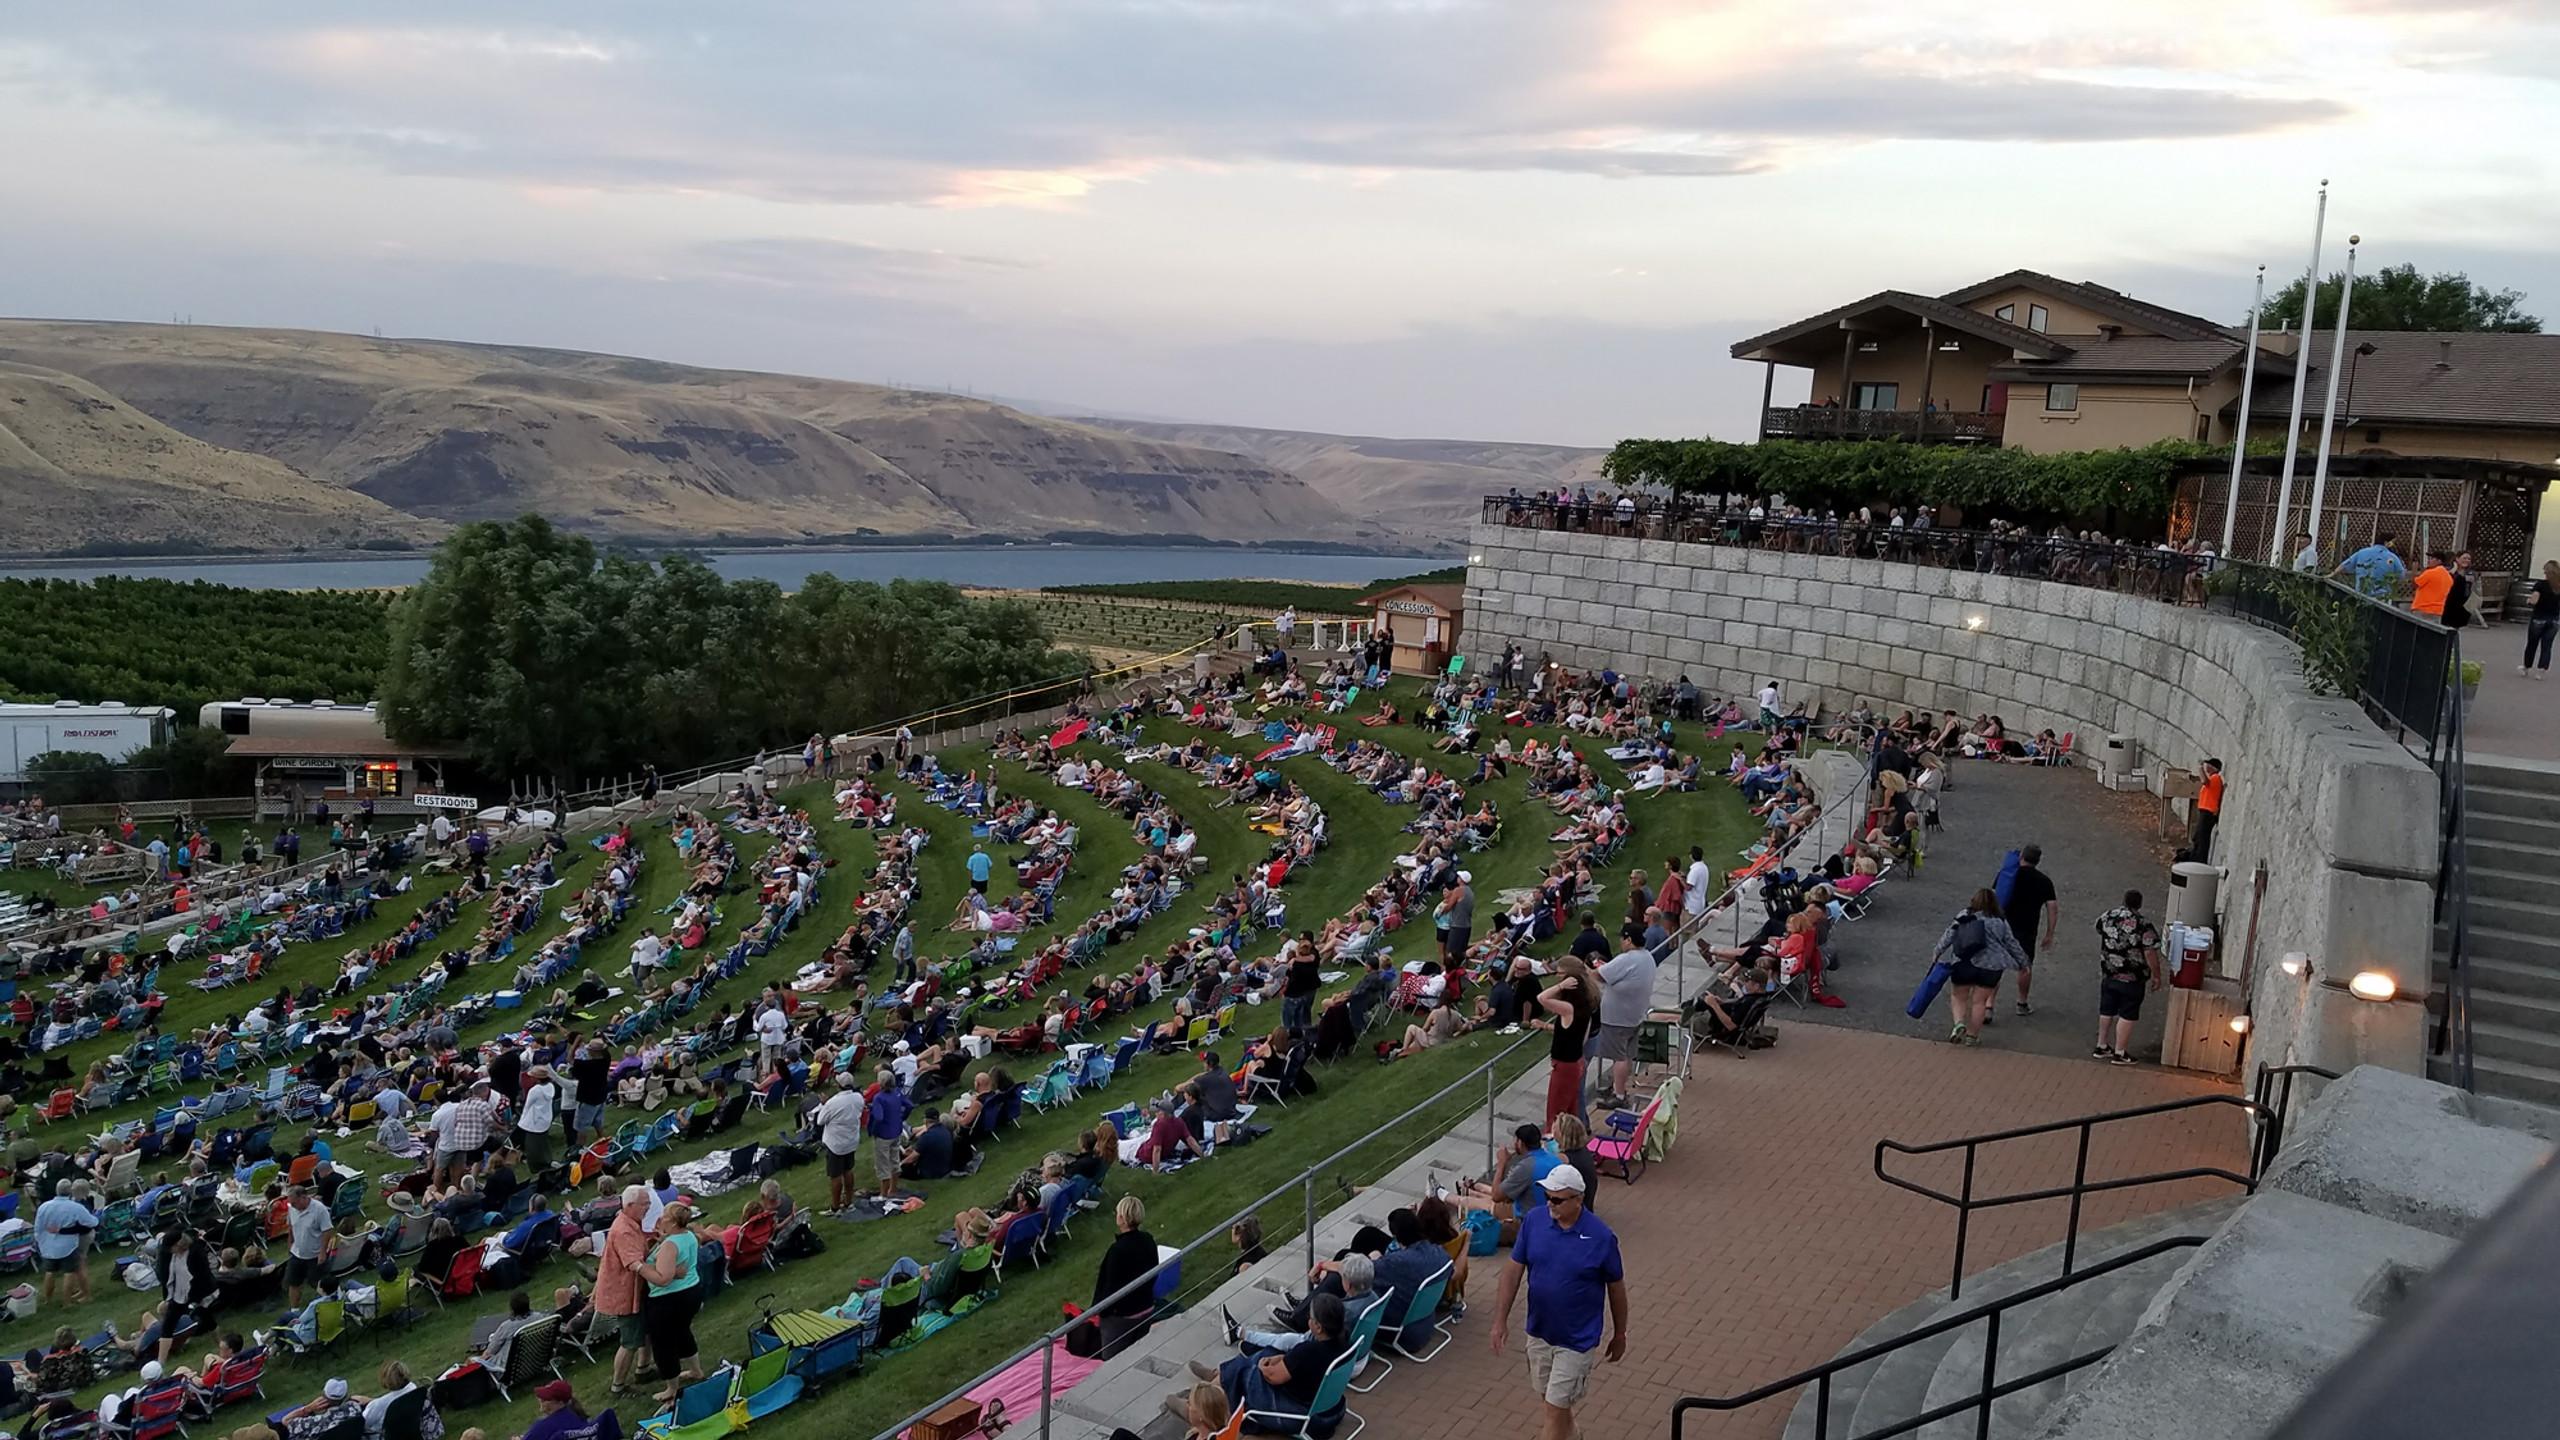 Maryhill Winery Concert